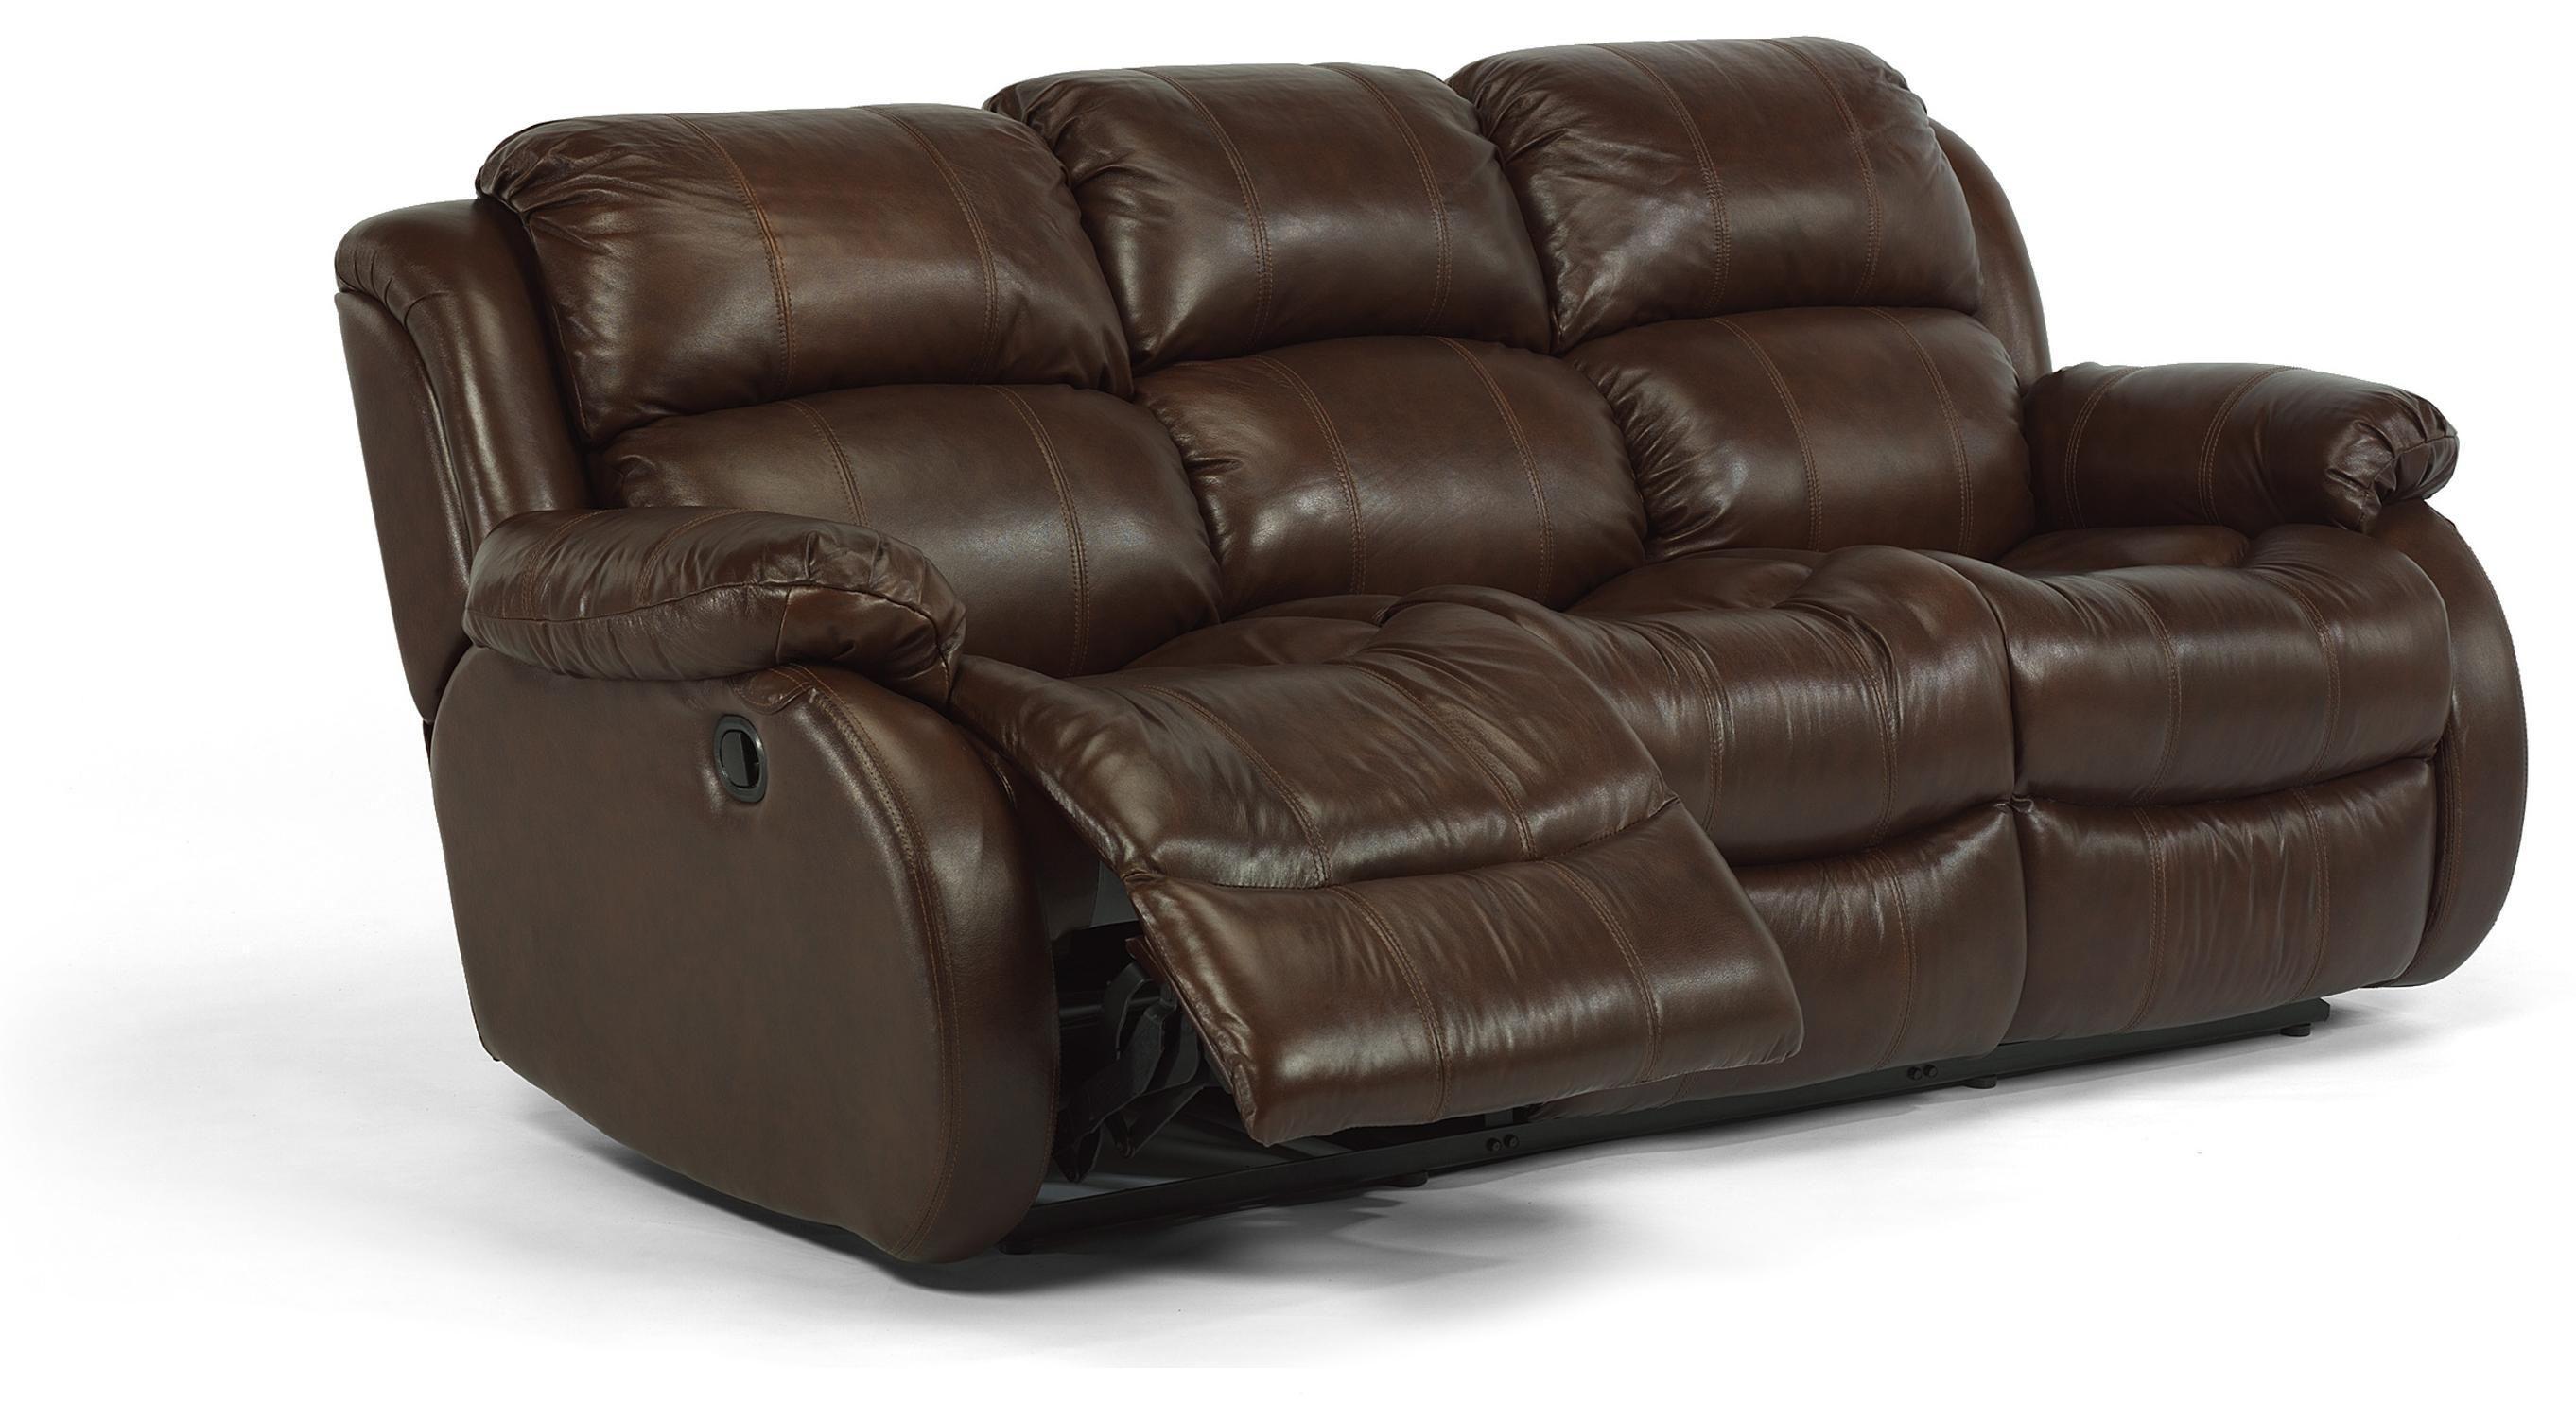 Flexsteel Furniture Latitudes Leather Collection Featuring 3 Seat